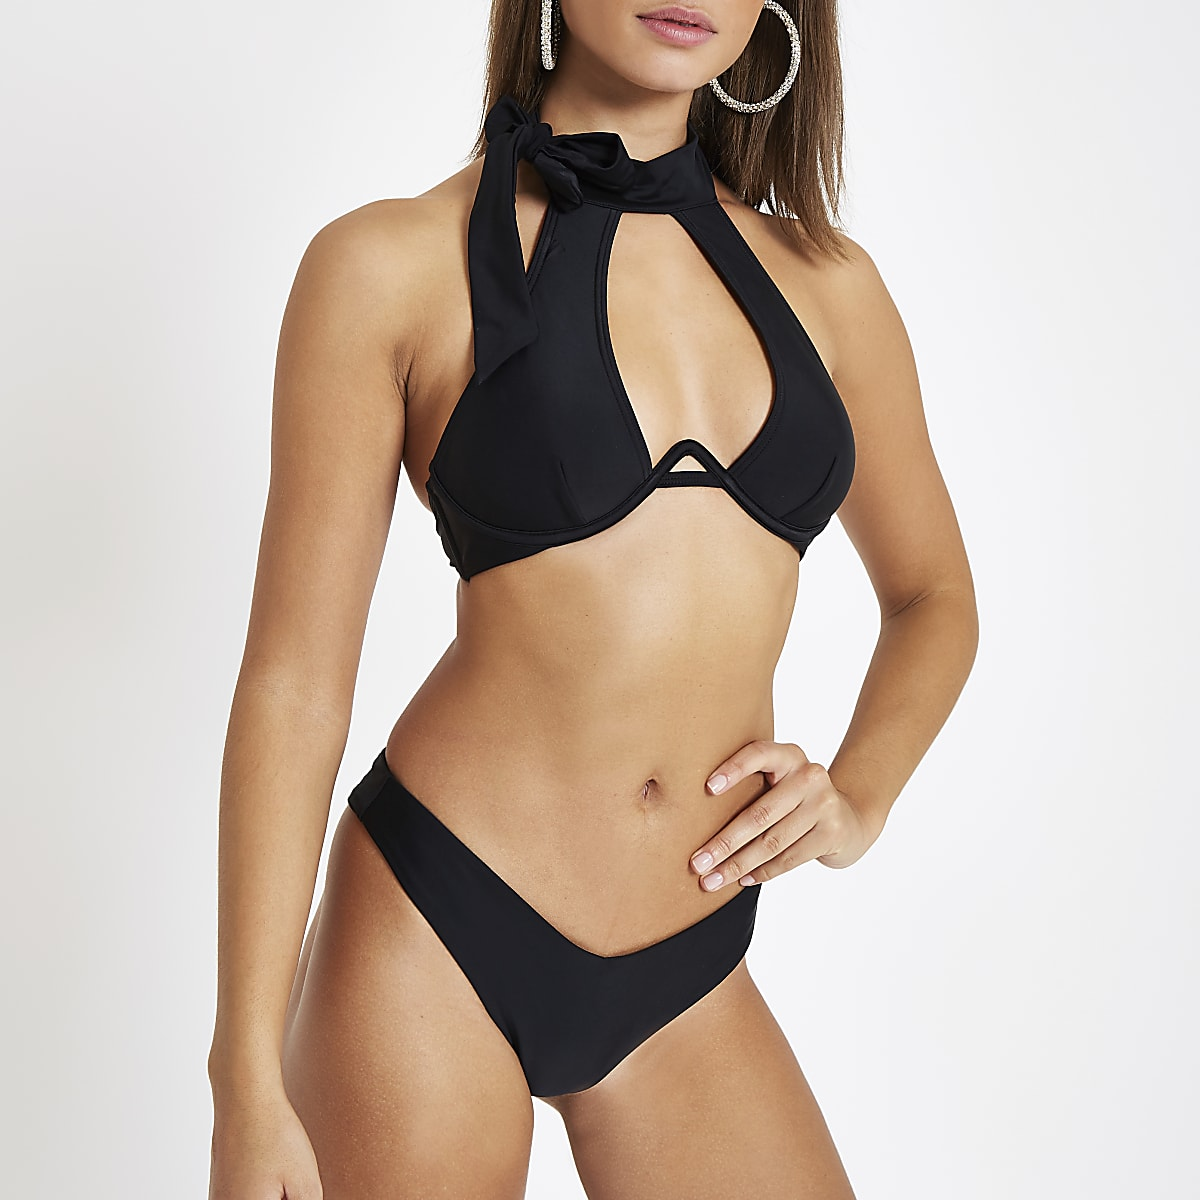 d153dede9f8 Black high leg bikini bottoms - Bikini Bottoms - Bikinis - Swimwear &  Beachwear - women